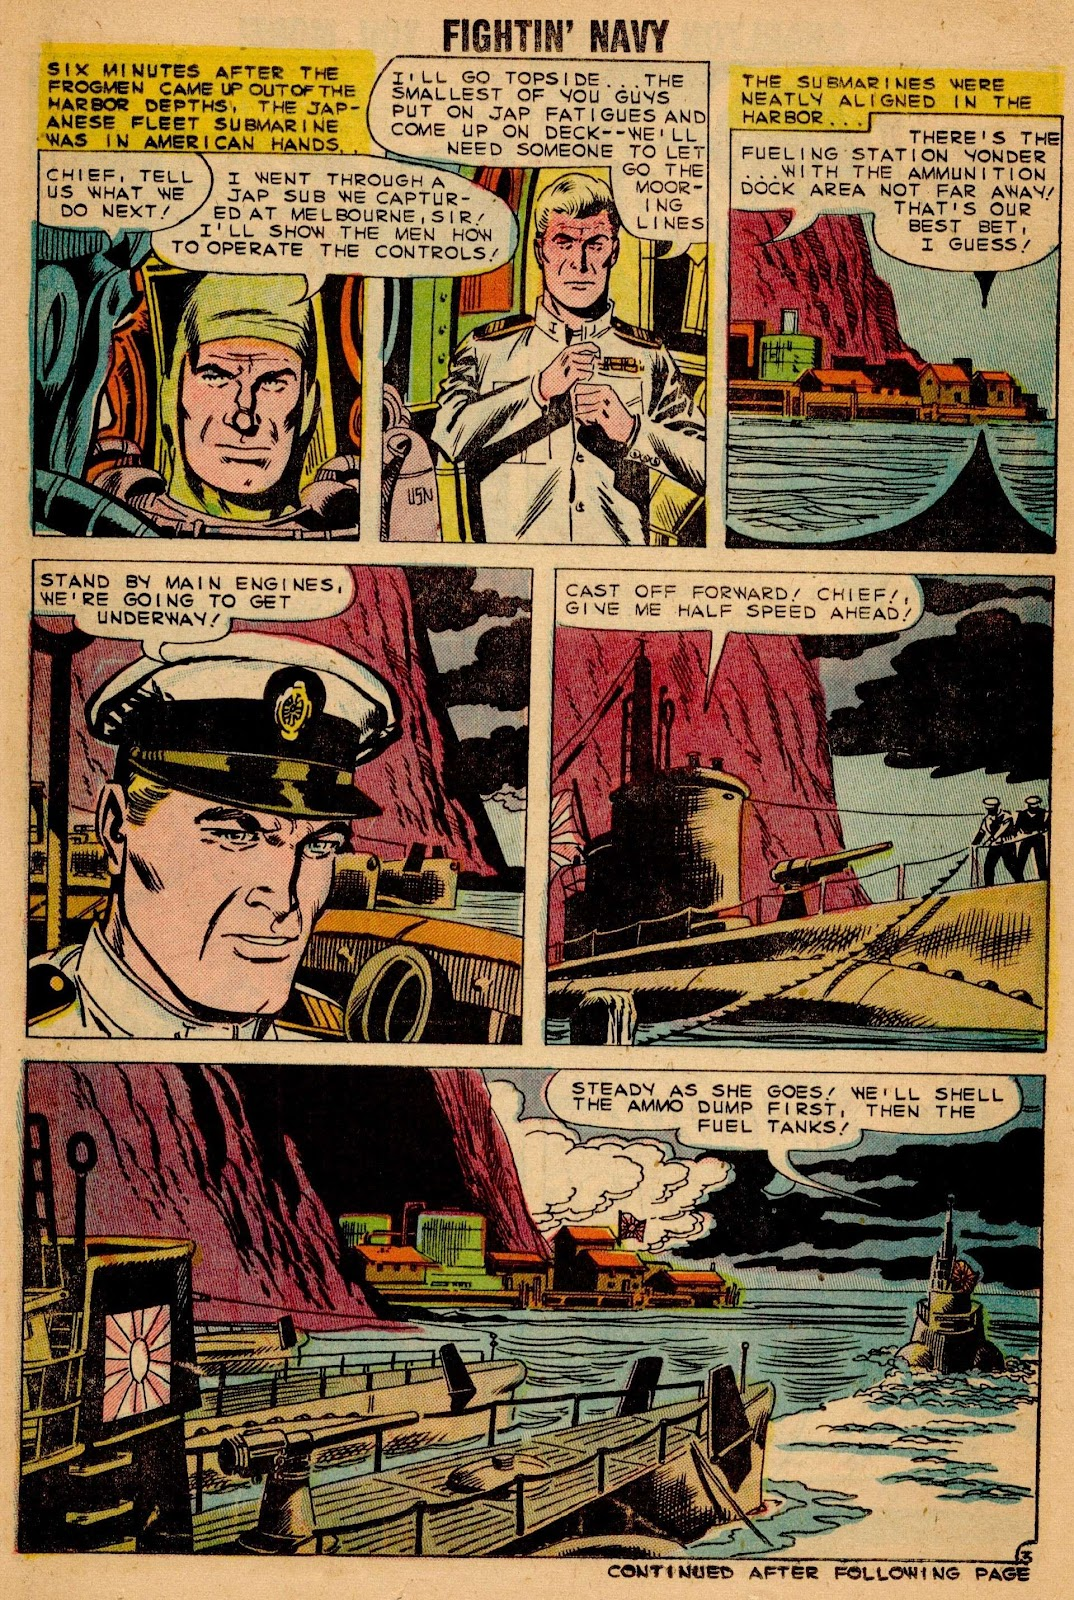 Read online Fightin' Navy comic -  Issue #90 - 14